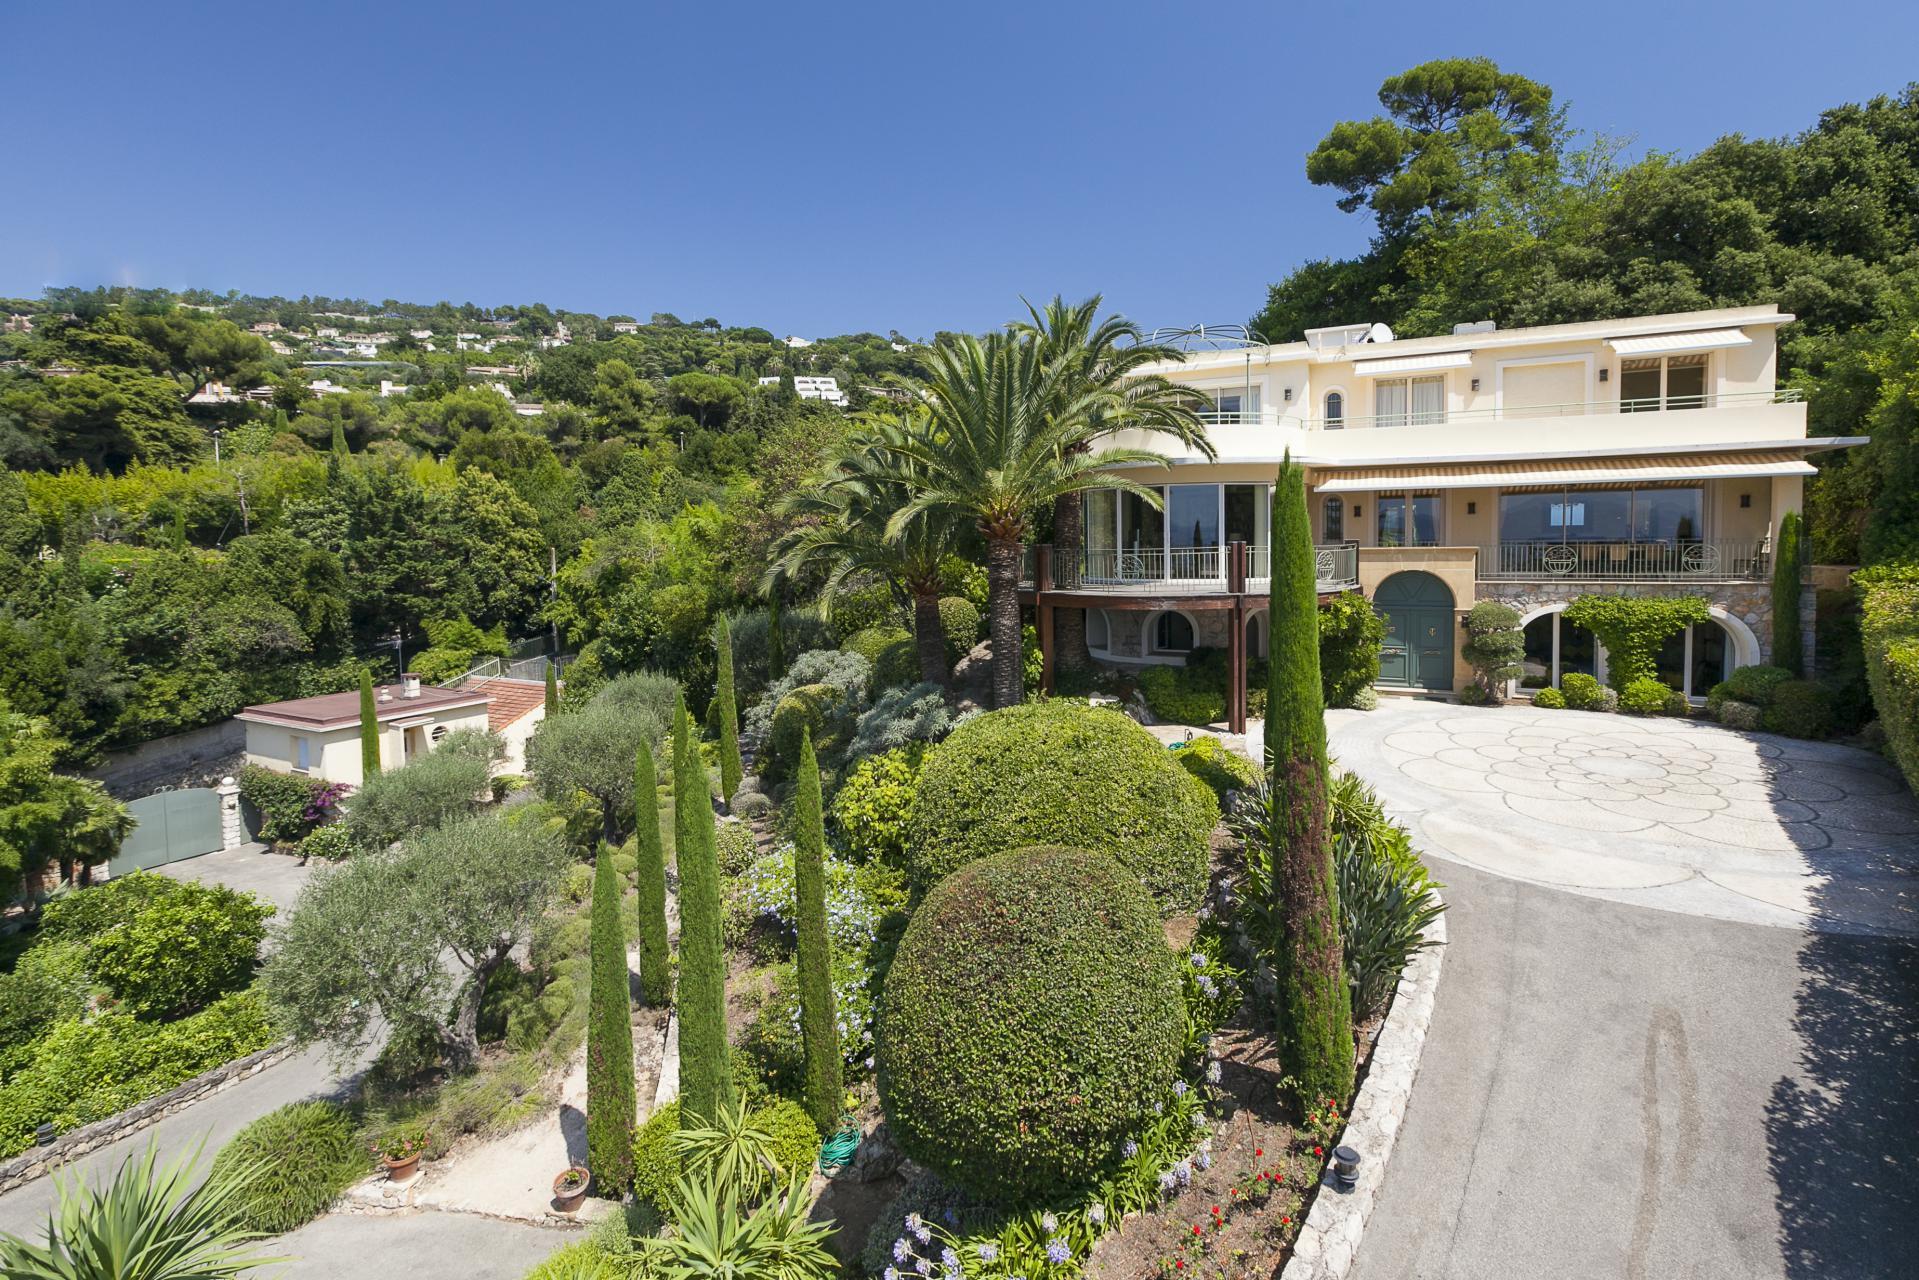 ad sale property cannes californie 06400 10 rooms ref. Black Bedroom Furniture Sets. Home Design Ideas